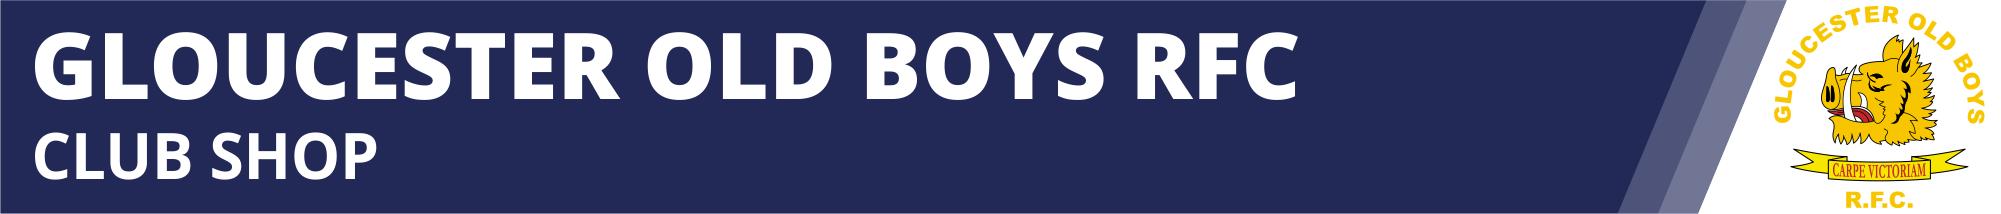 gloucester-old-boys-rfc-club-shop-banner.png